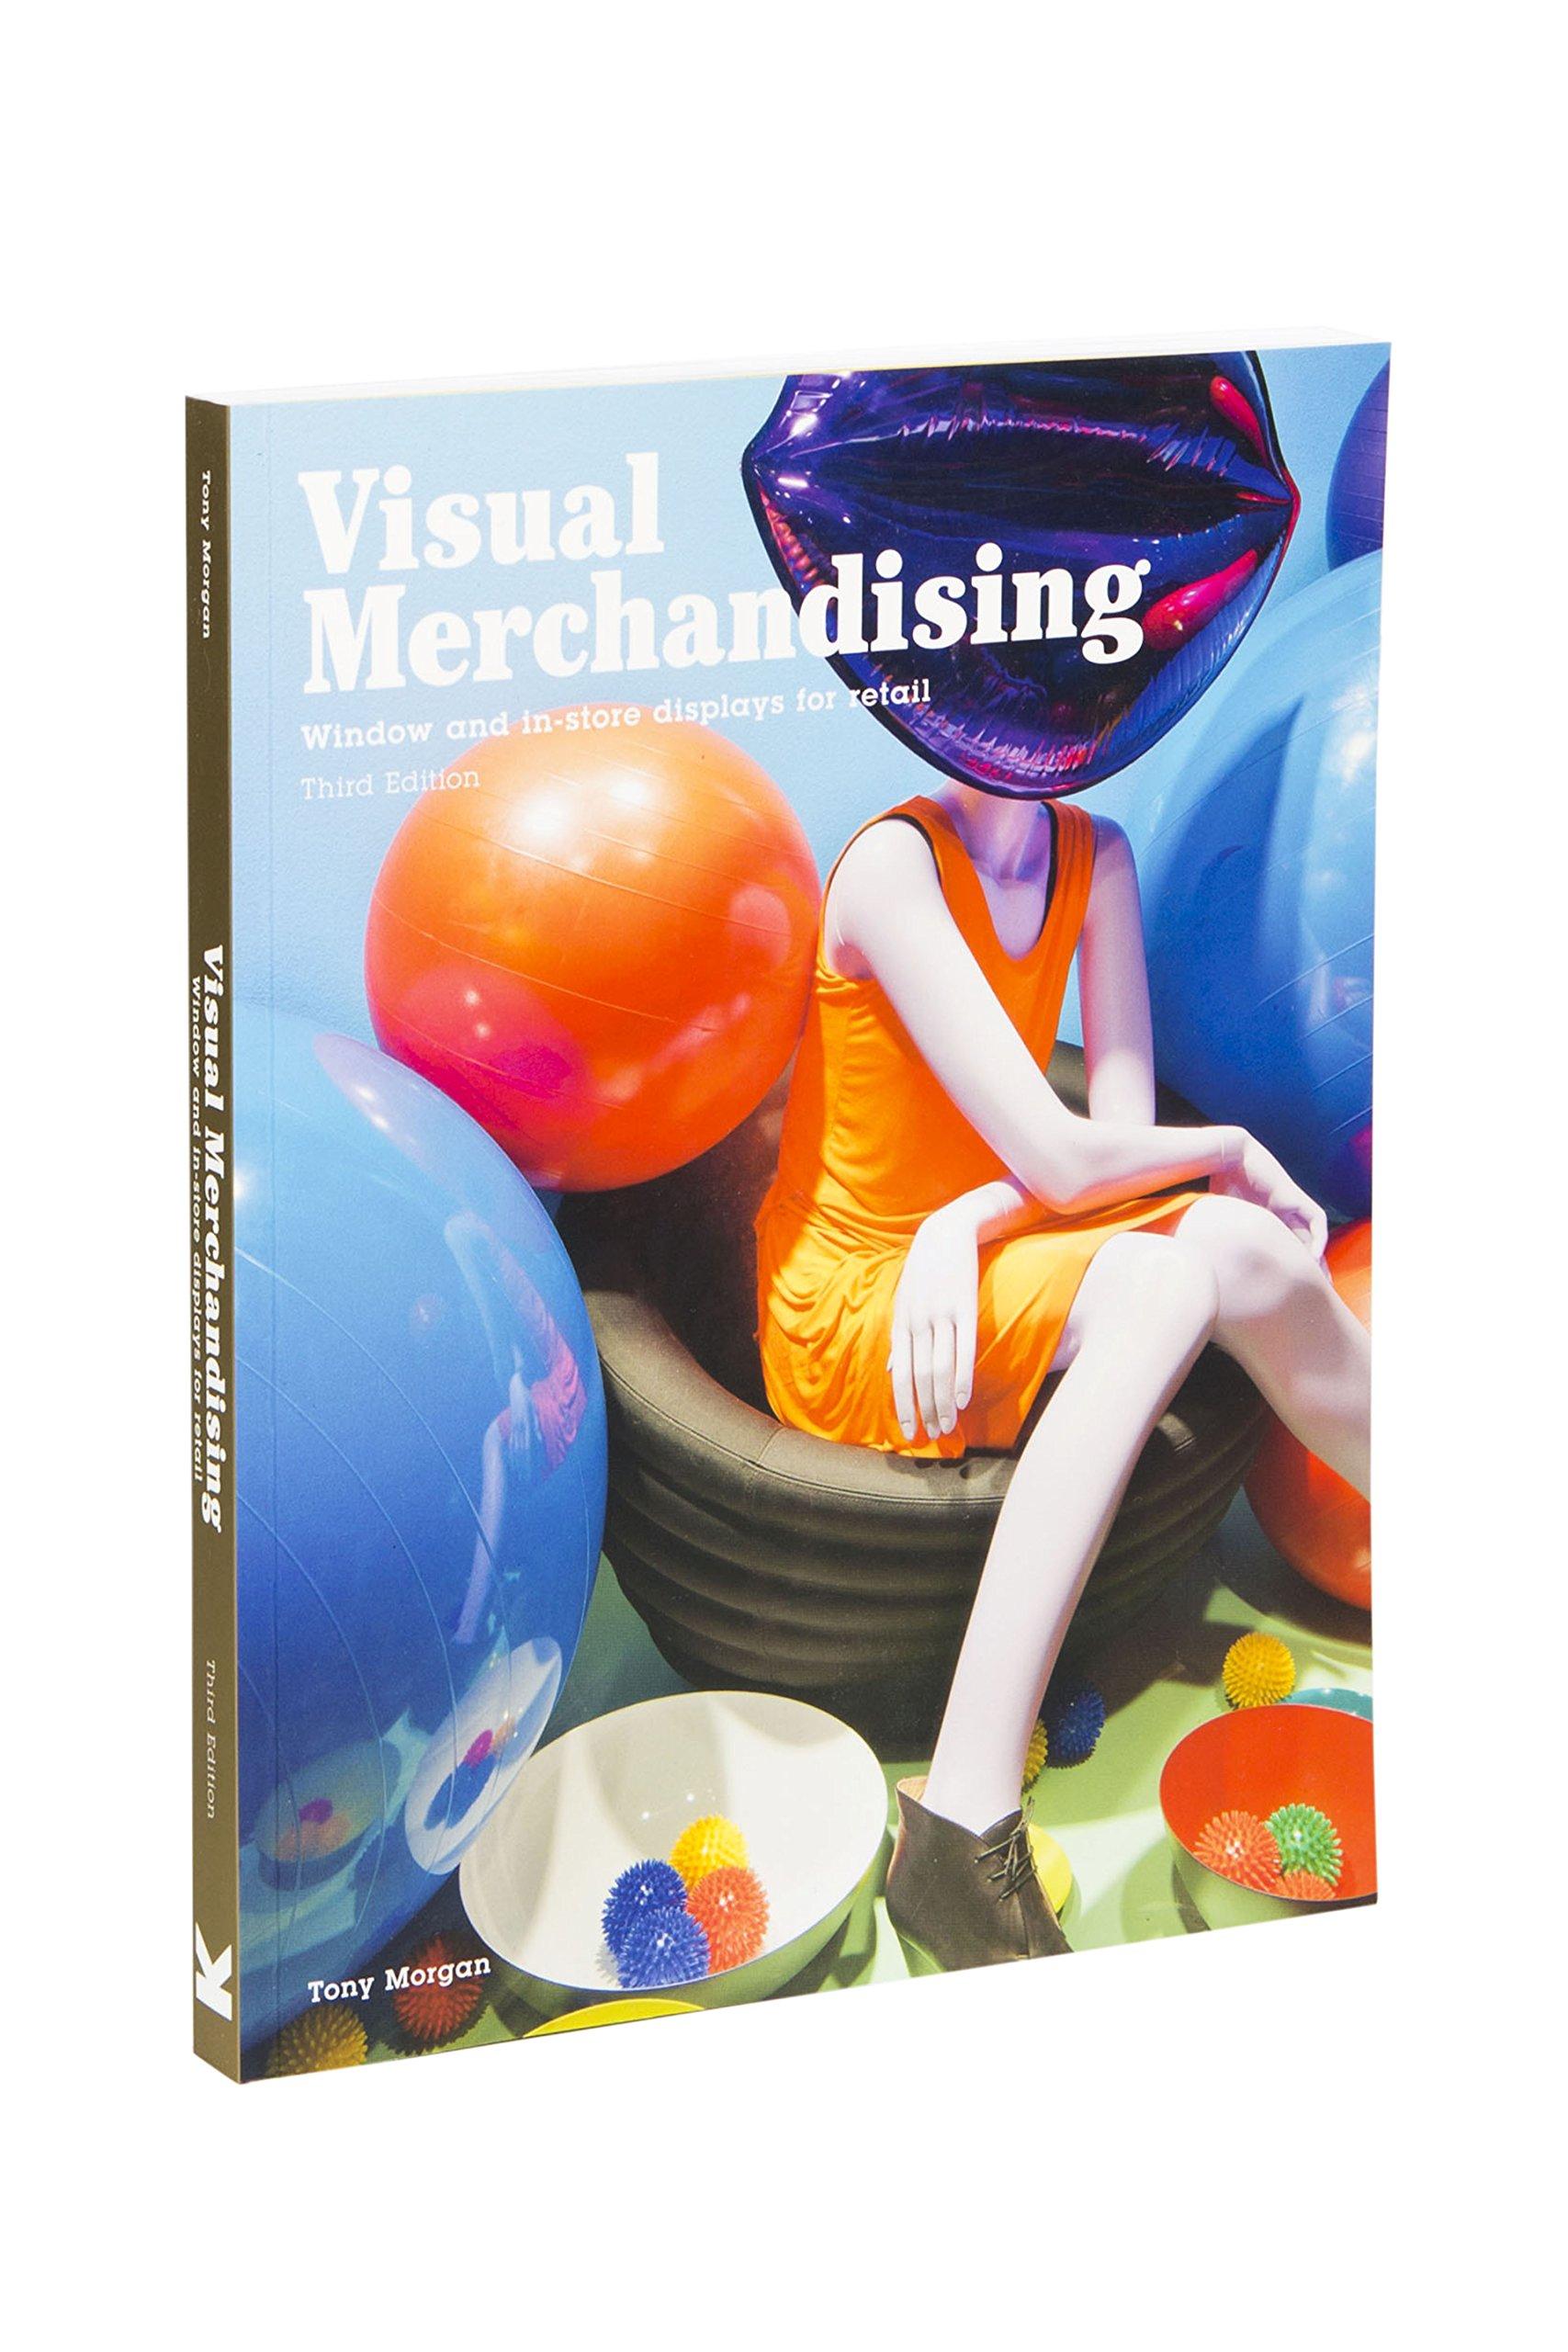 amazon visual merchandising third edition windows and in store